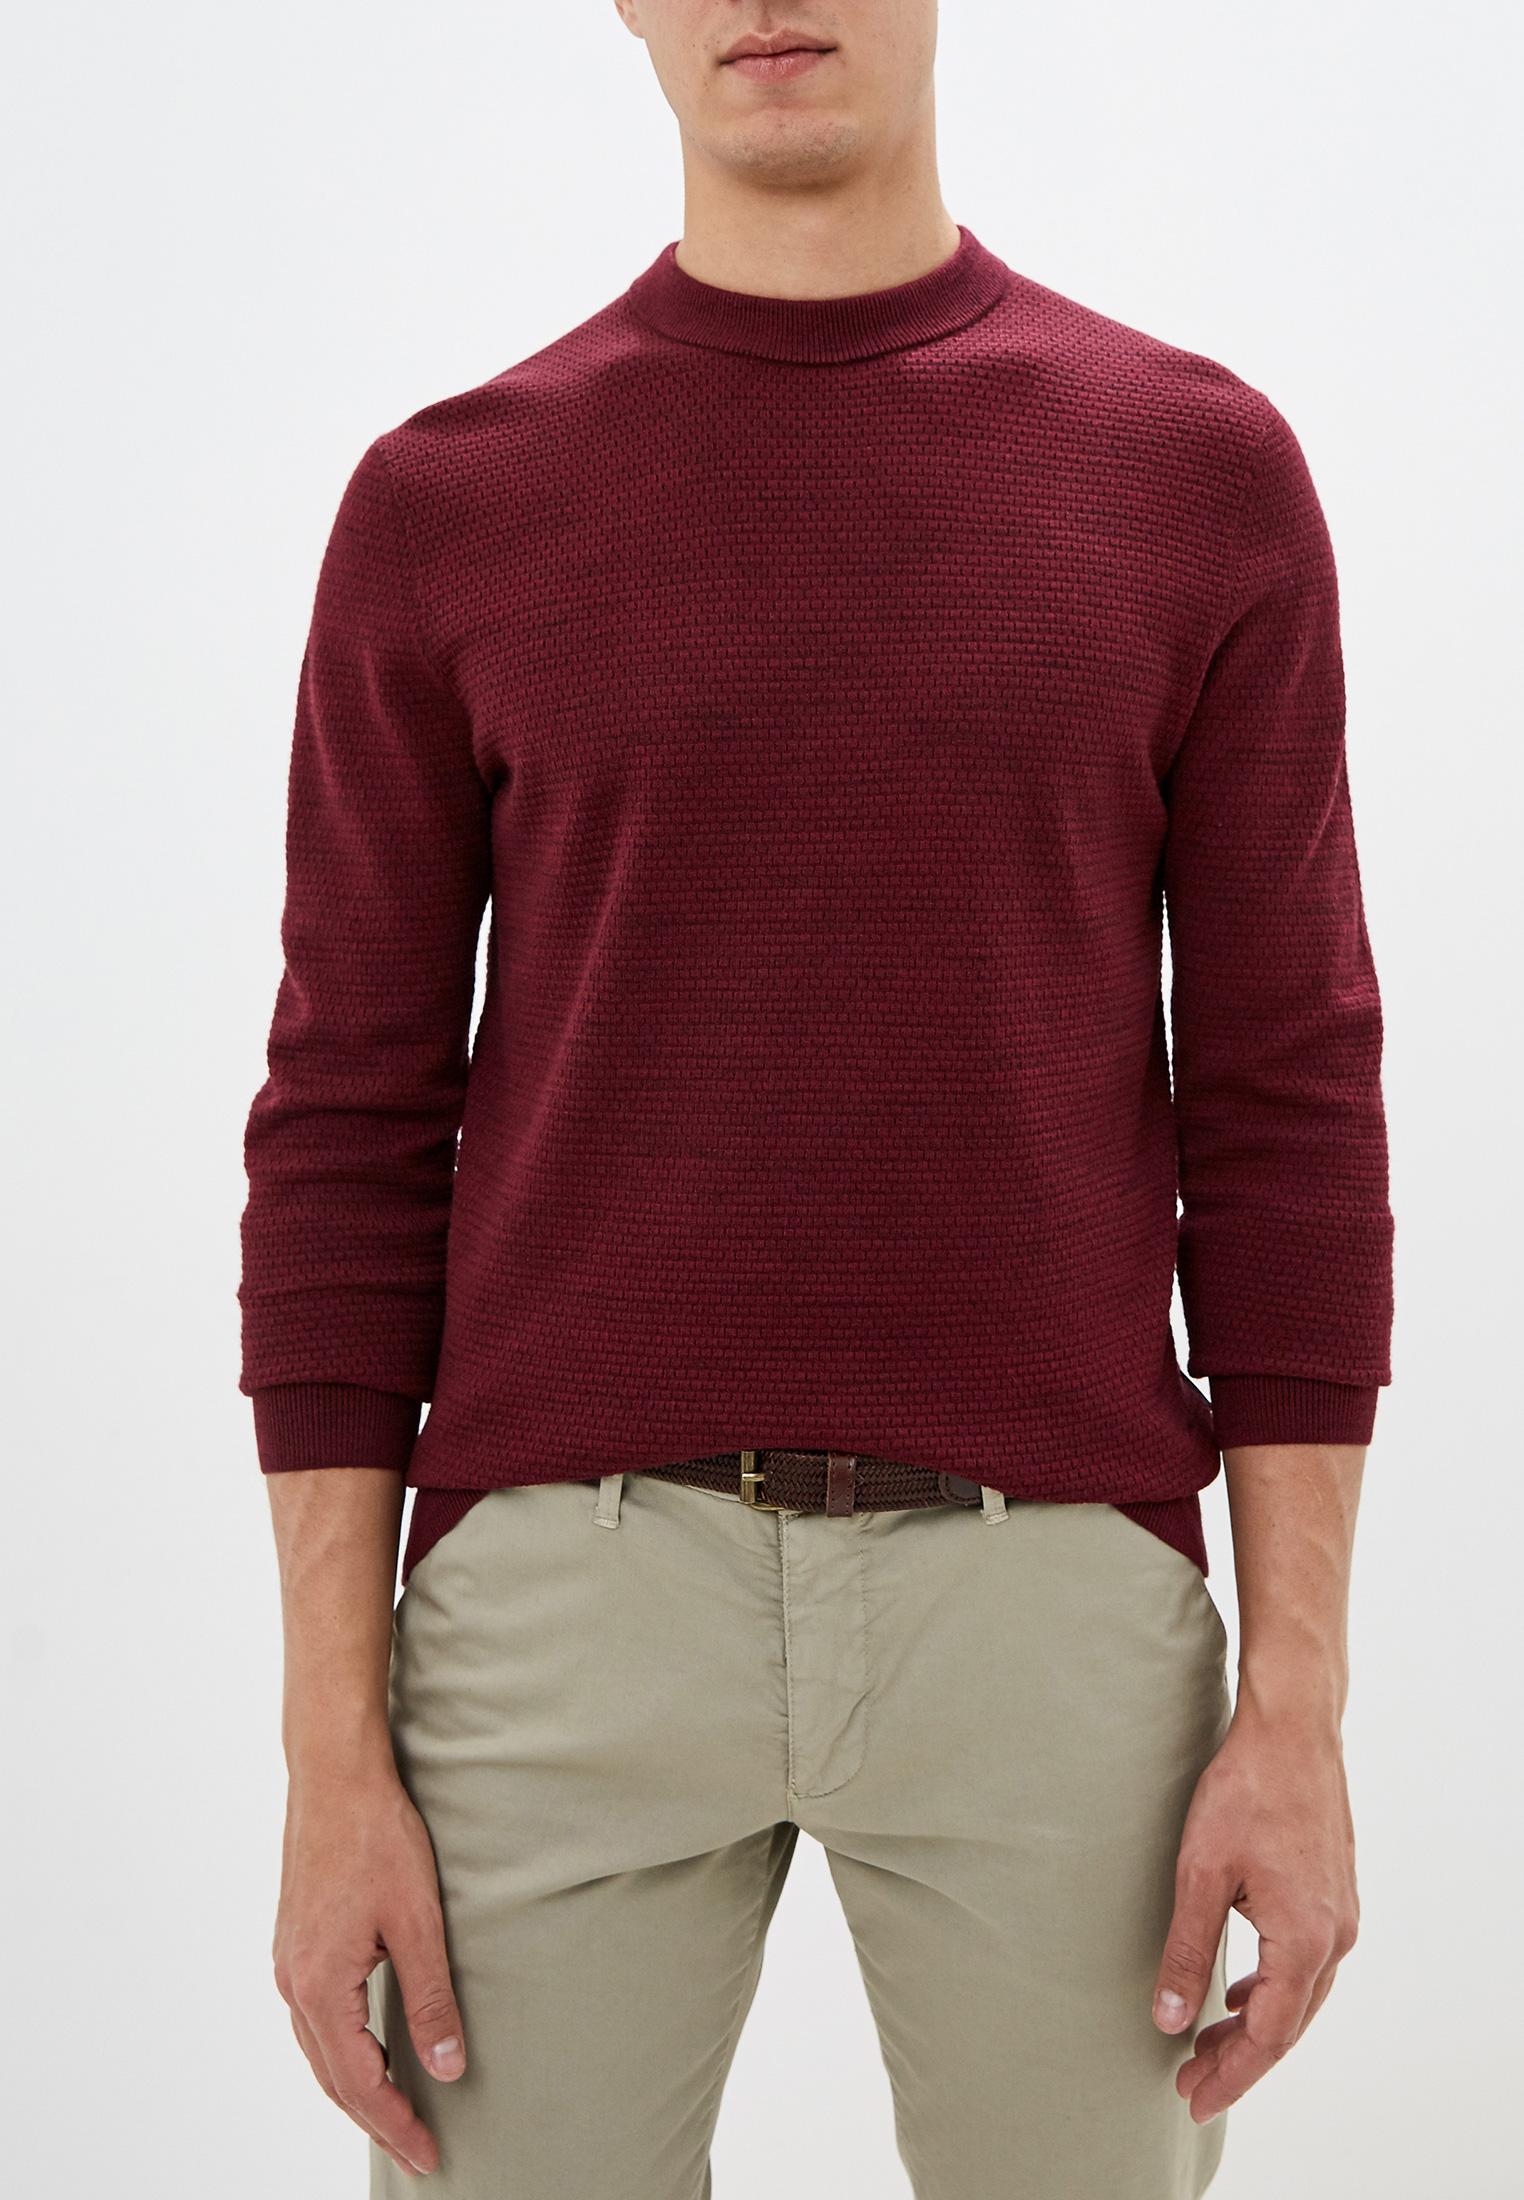 Джемпер Calvin Klein (Кельвин Кляйн) k10k104541